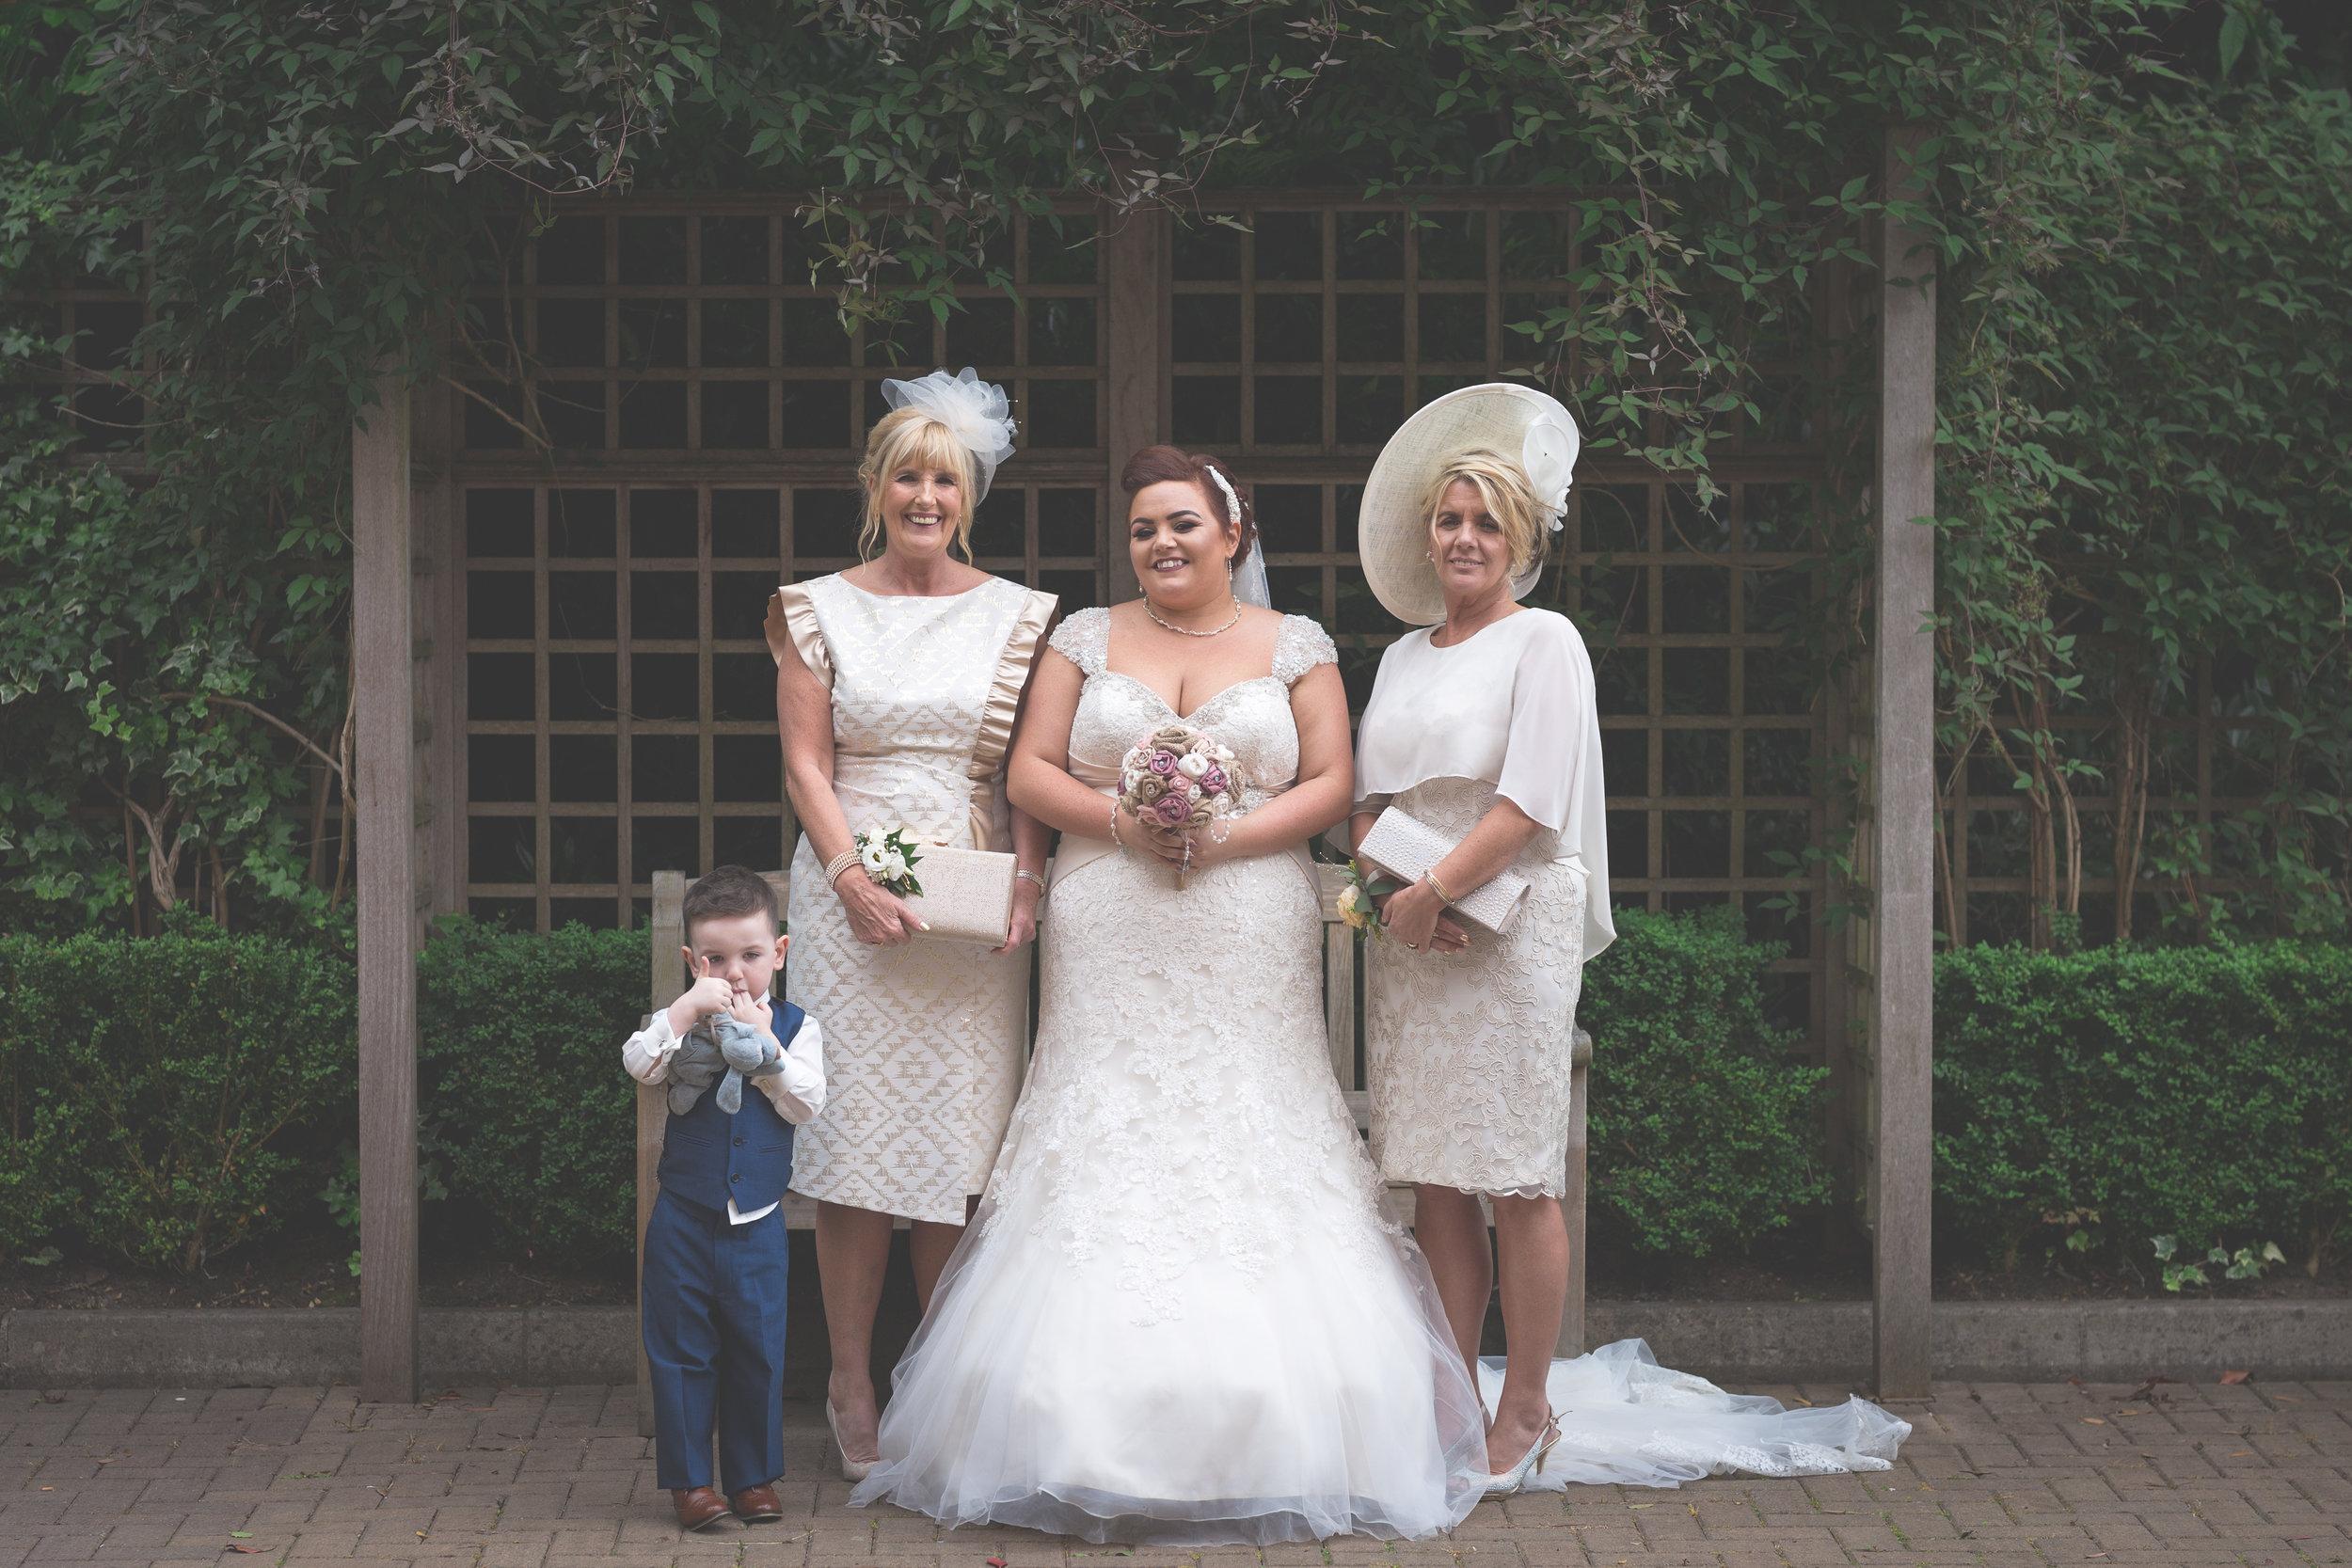 Antoinette & Stephen - Portraits   Brian McEwan Photography   Wedding Photographer Northern Ireland 58.jpg